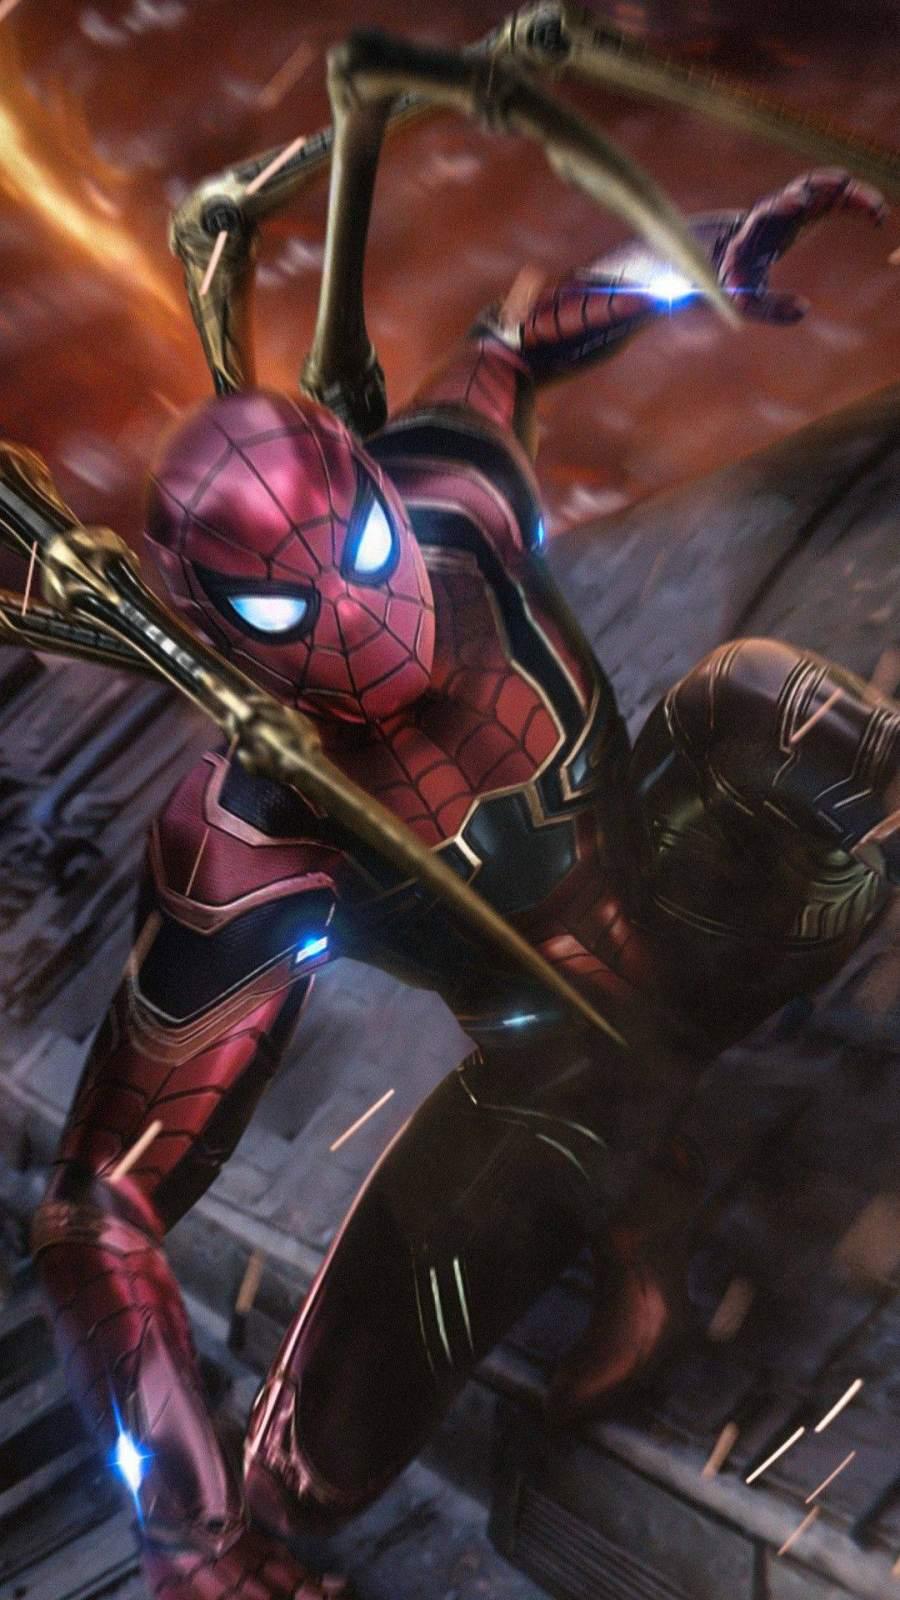 Spiderman Hd Wallpaper Iron Spiderman Endgame Action Iphone Wallpaper Iphone